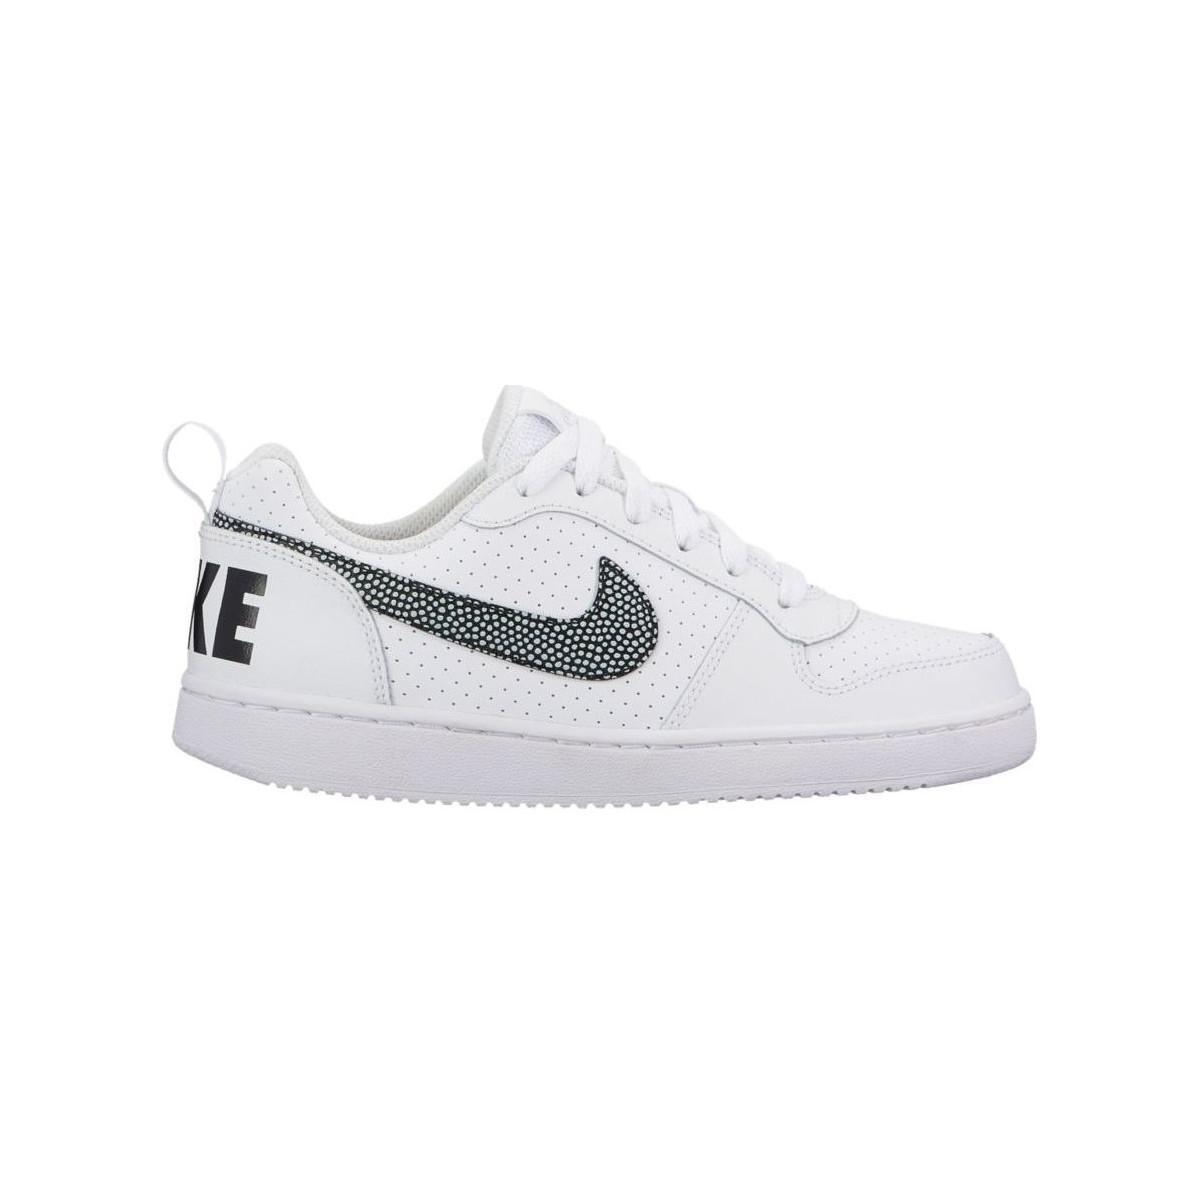 Nike Boys' Court Borough Low (gs) Shoe 839985 103 Women's Shoes (trainers) In White